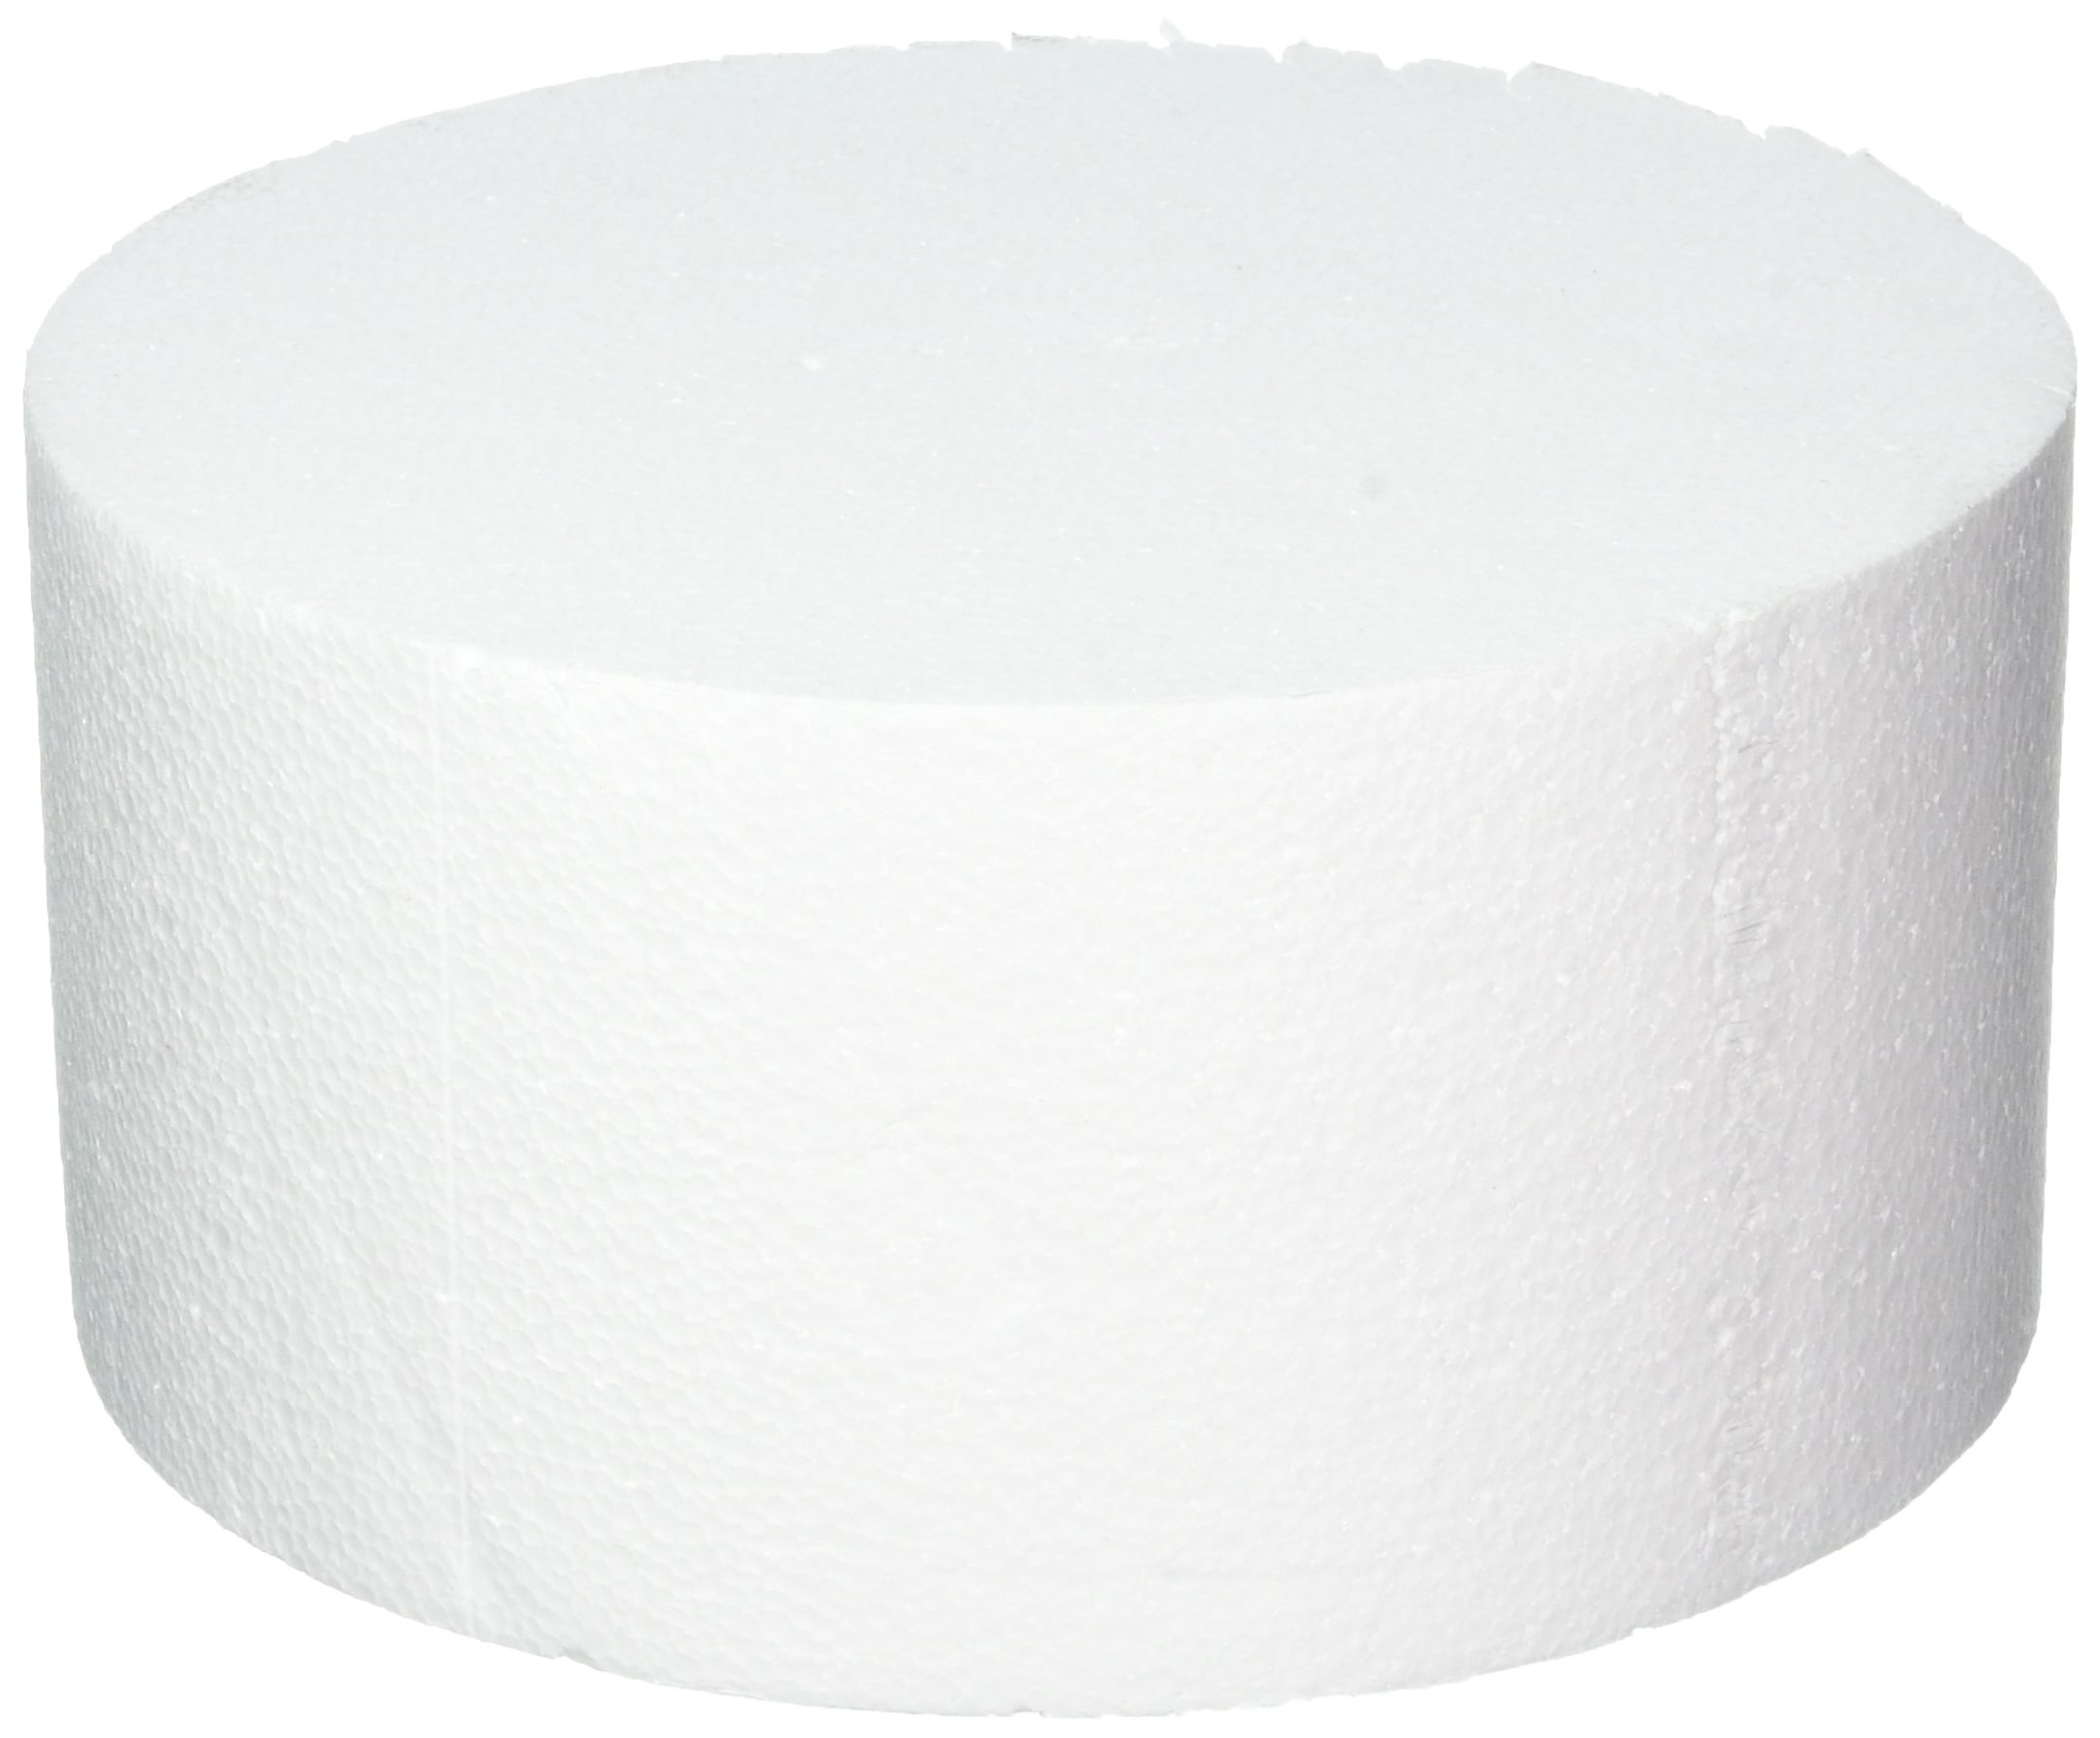 Oasis Supply 747090 Dummy Round Cake, 10'' x 5'', White